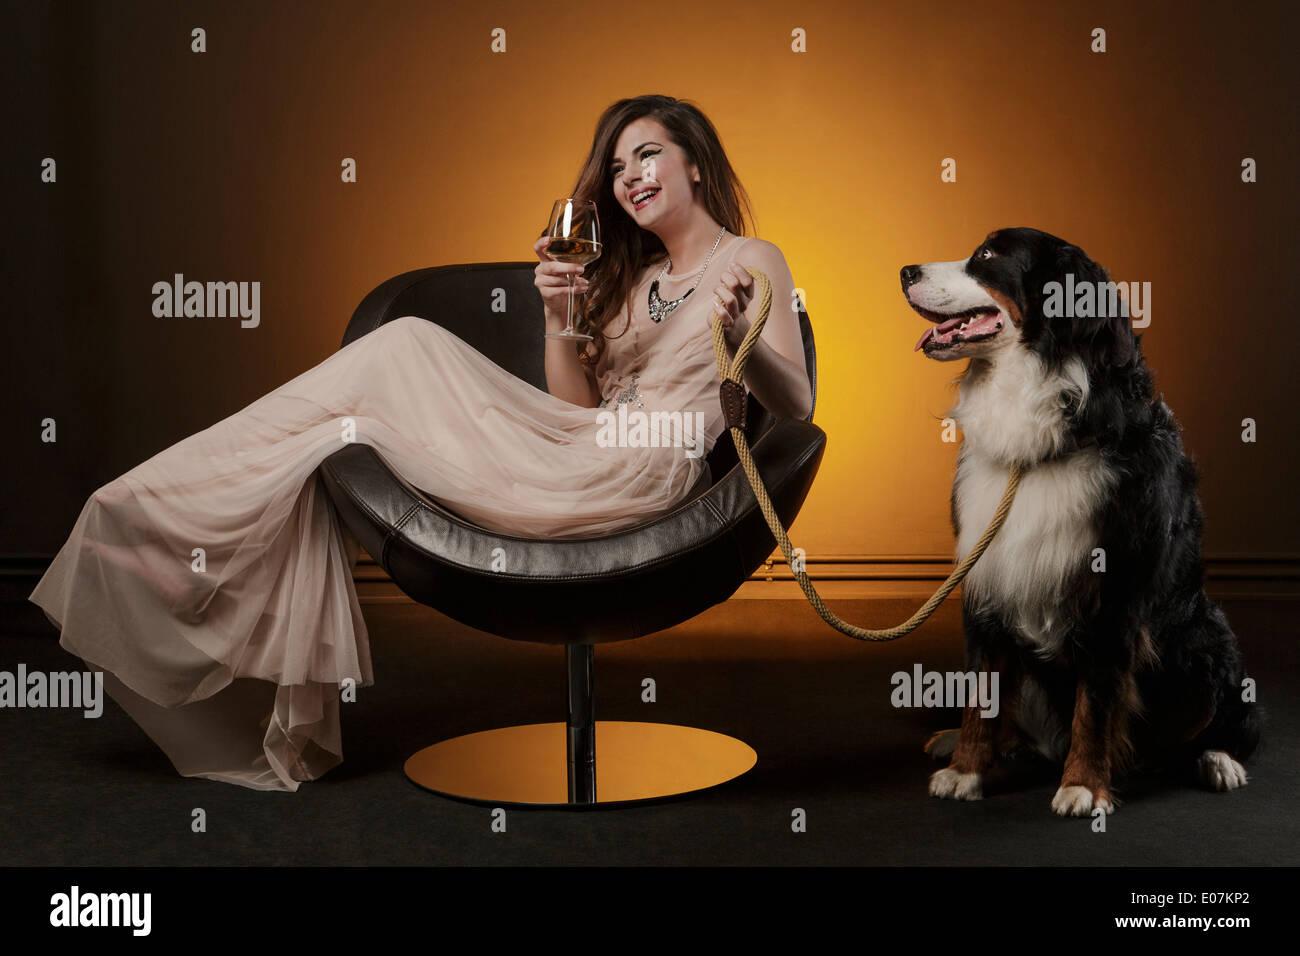 Woman drinking a glass of wine alongside huge dog - Stock Image